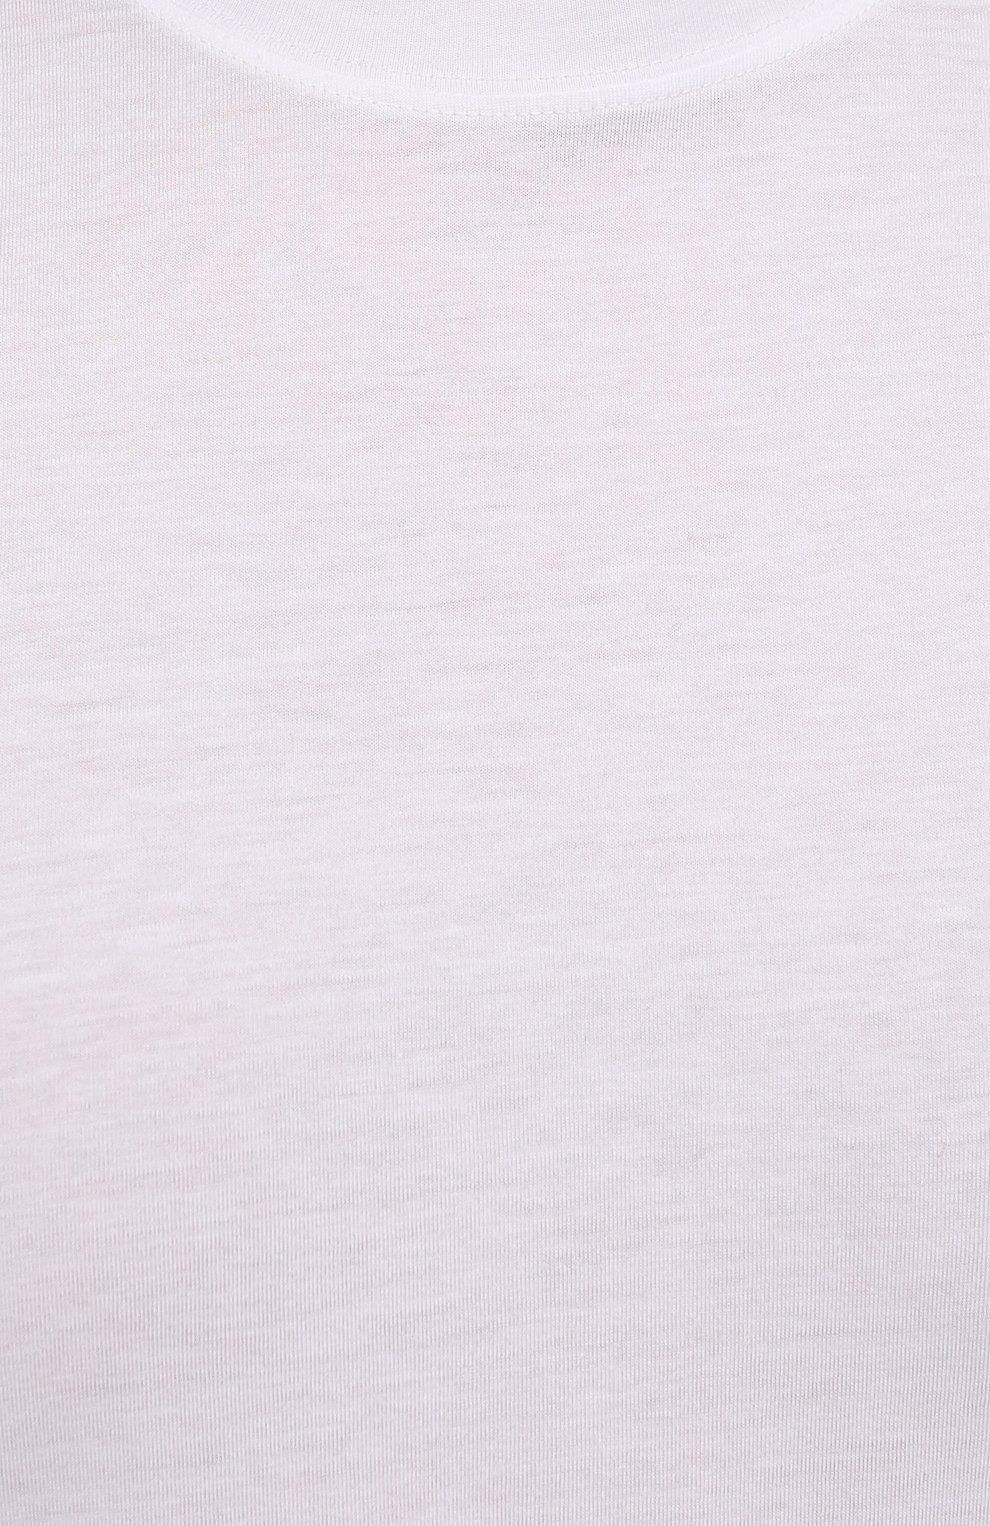 Мужская футболка TOM FORD белого цвета, арт. BT229/TFJ950 | Фото 5